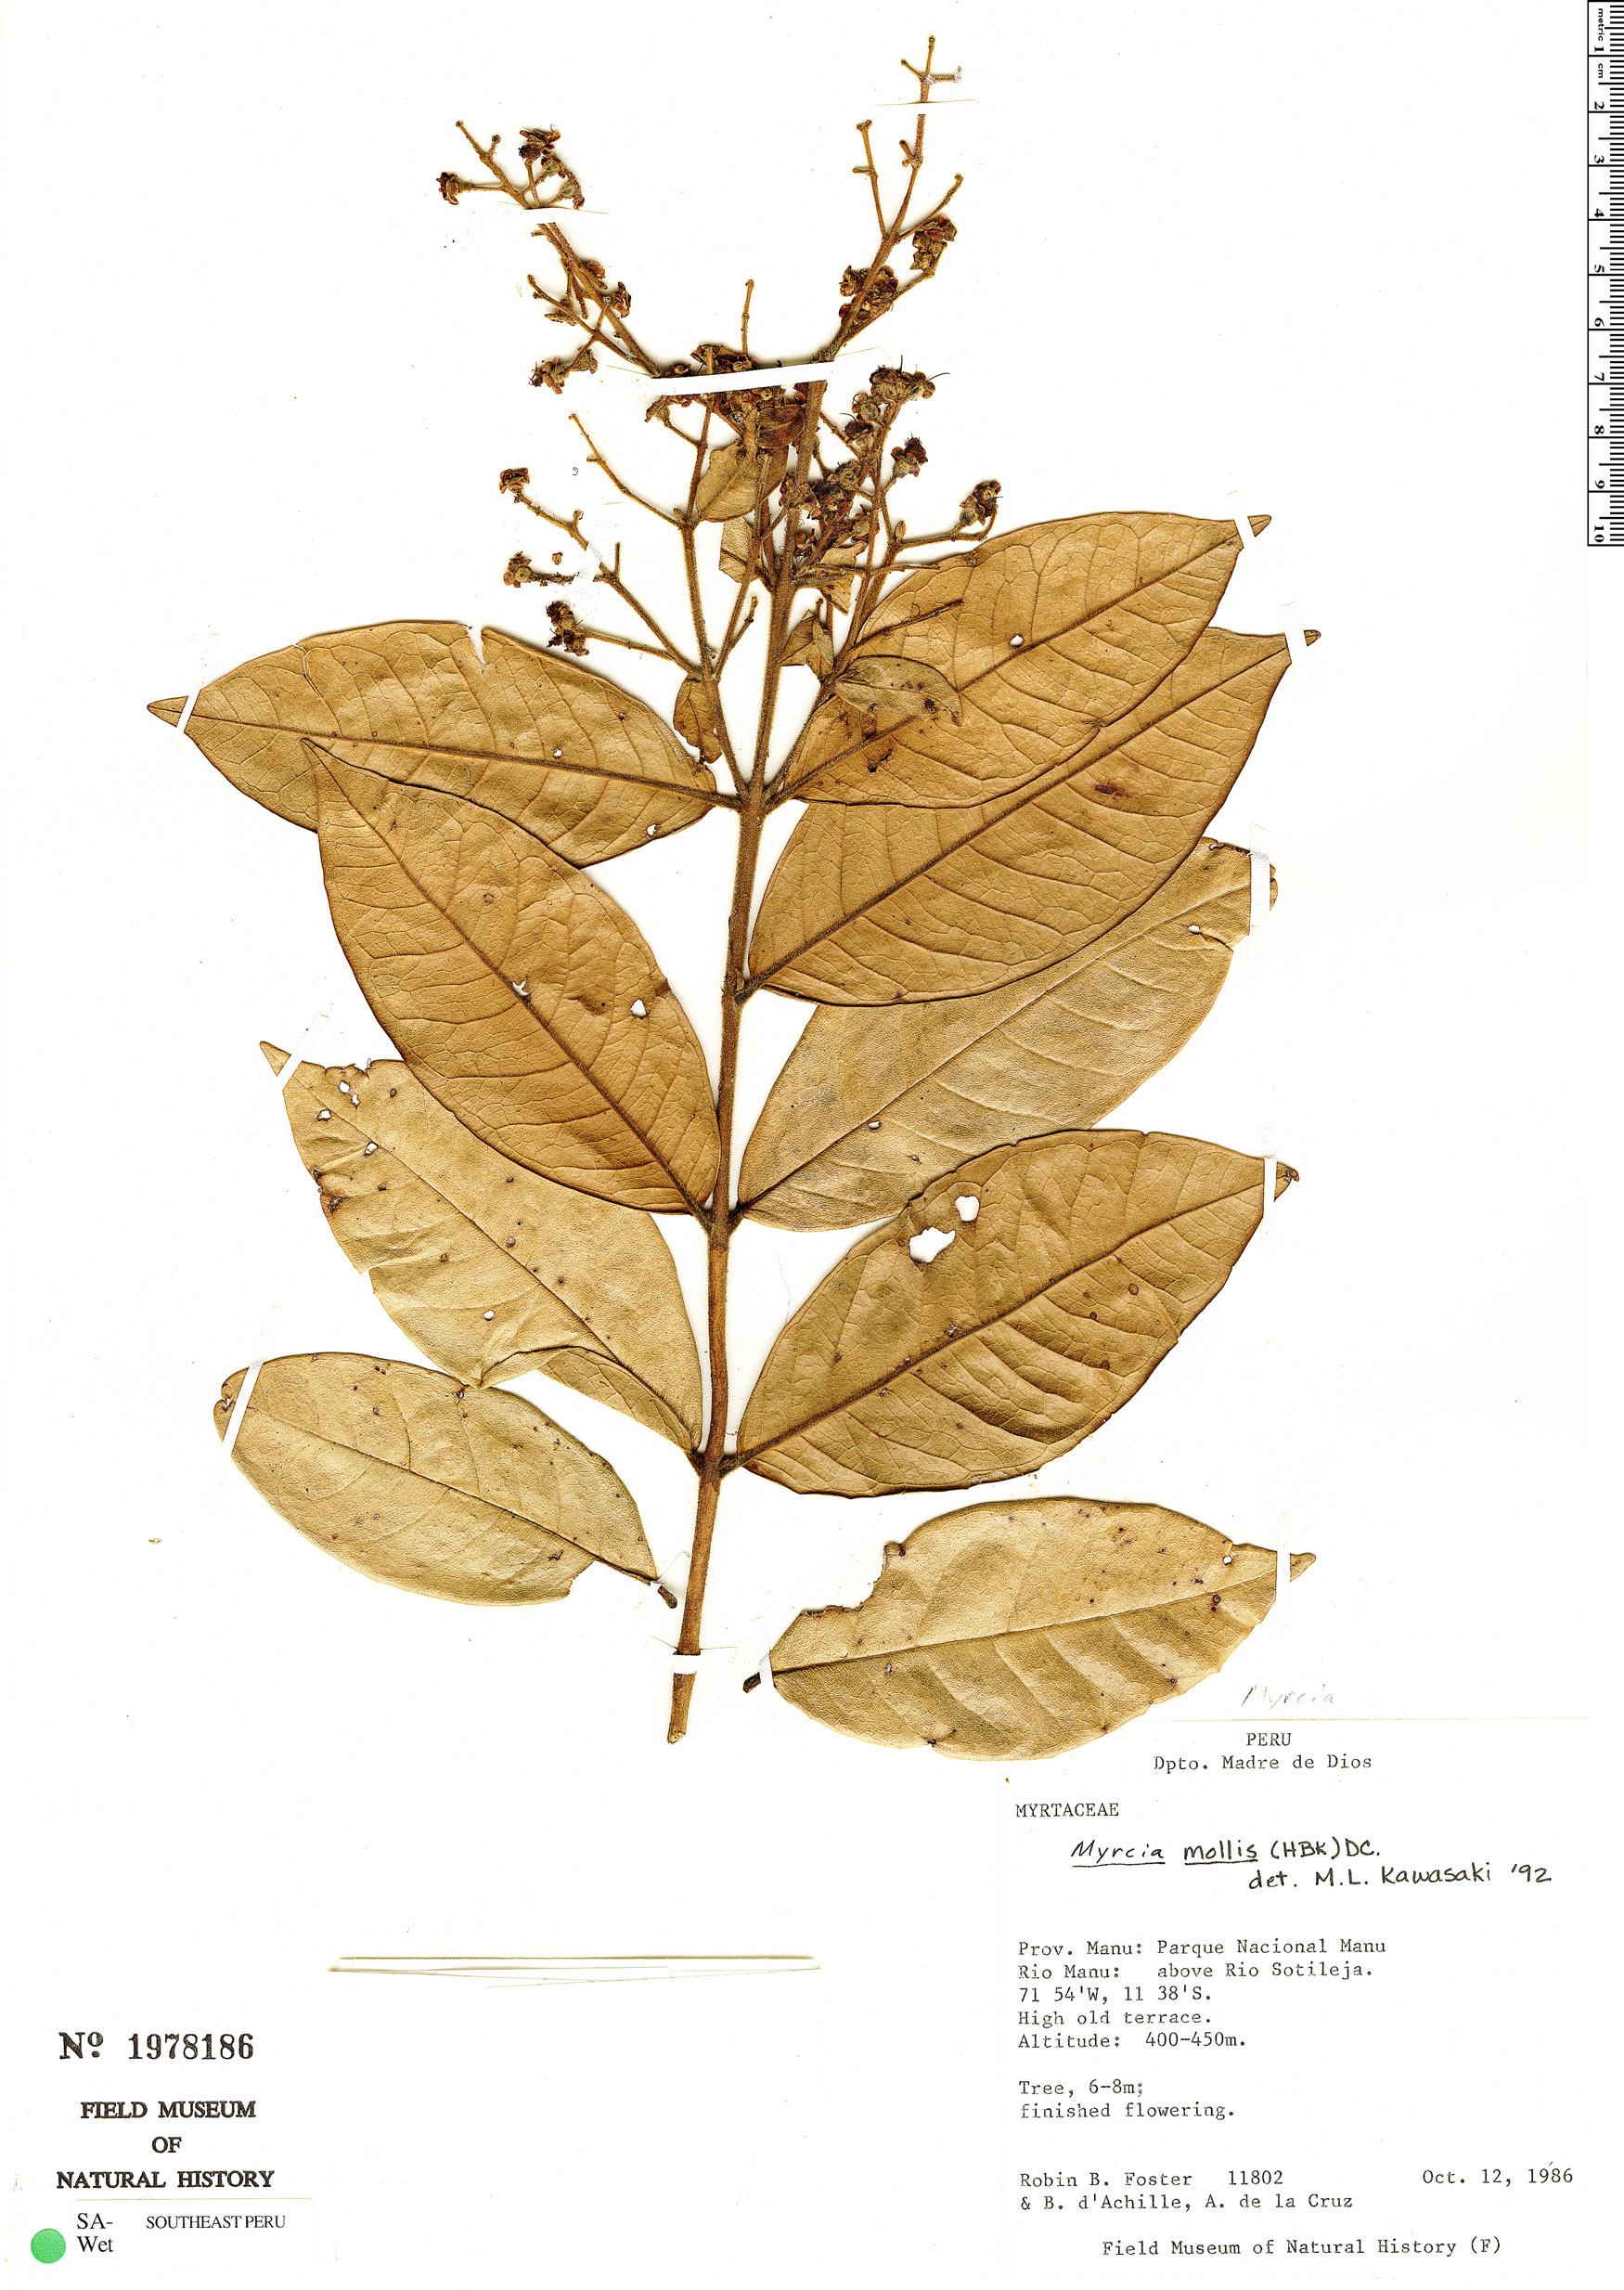 Specimen: Myrcia mollis